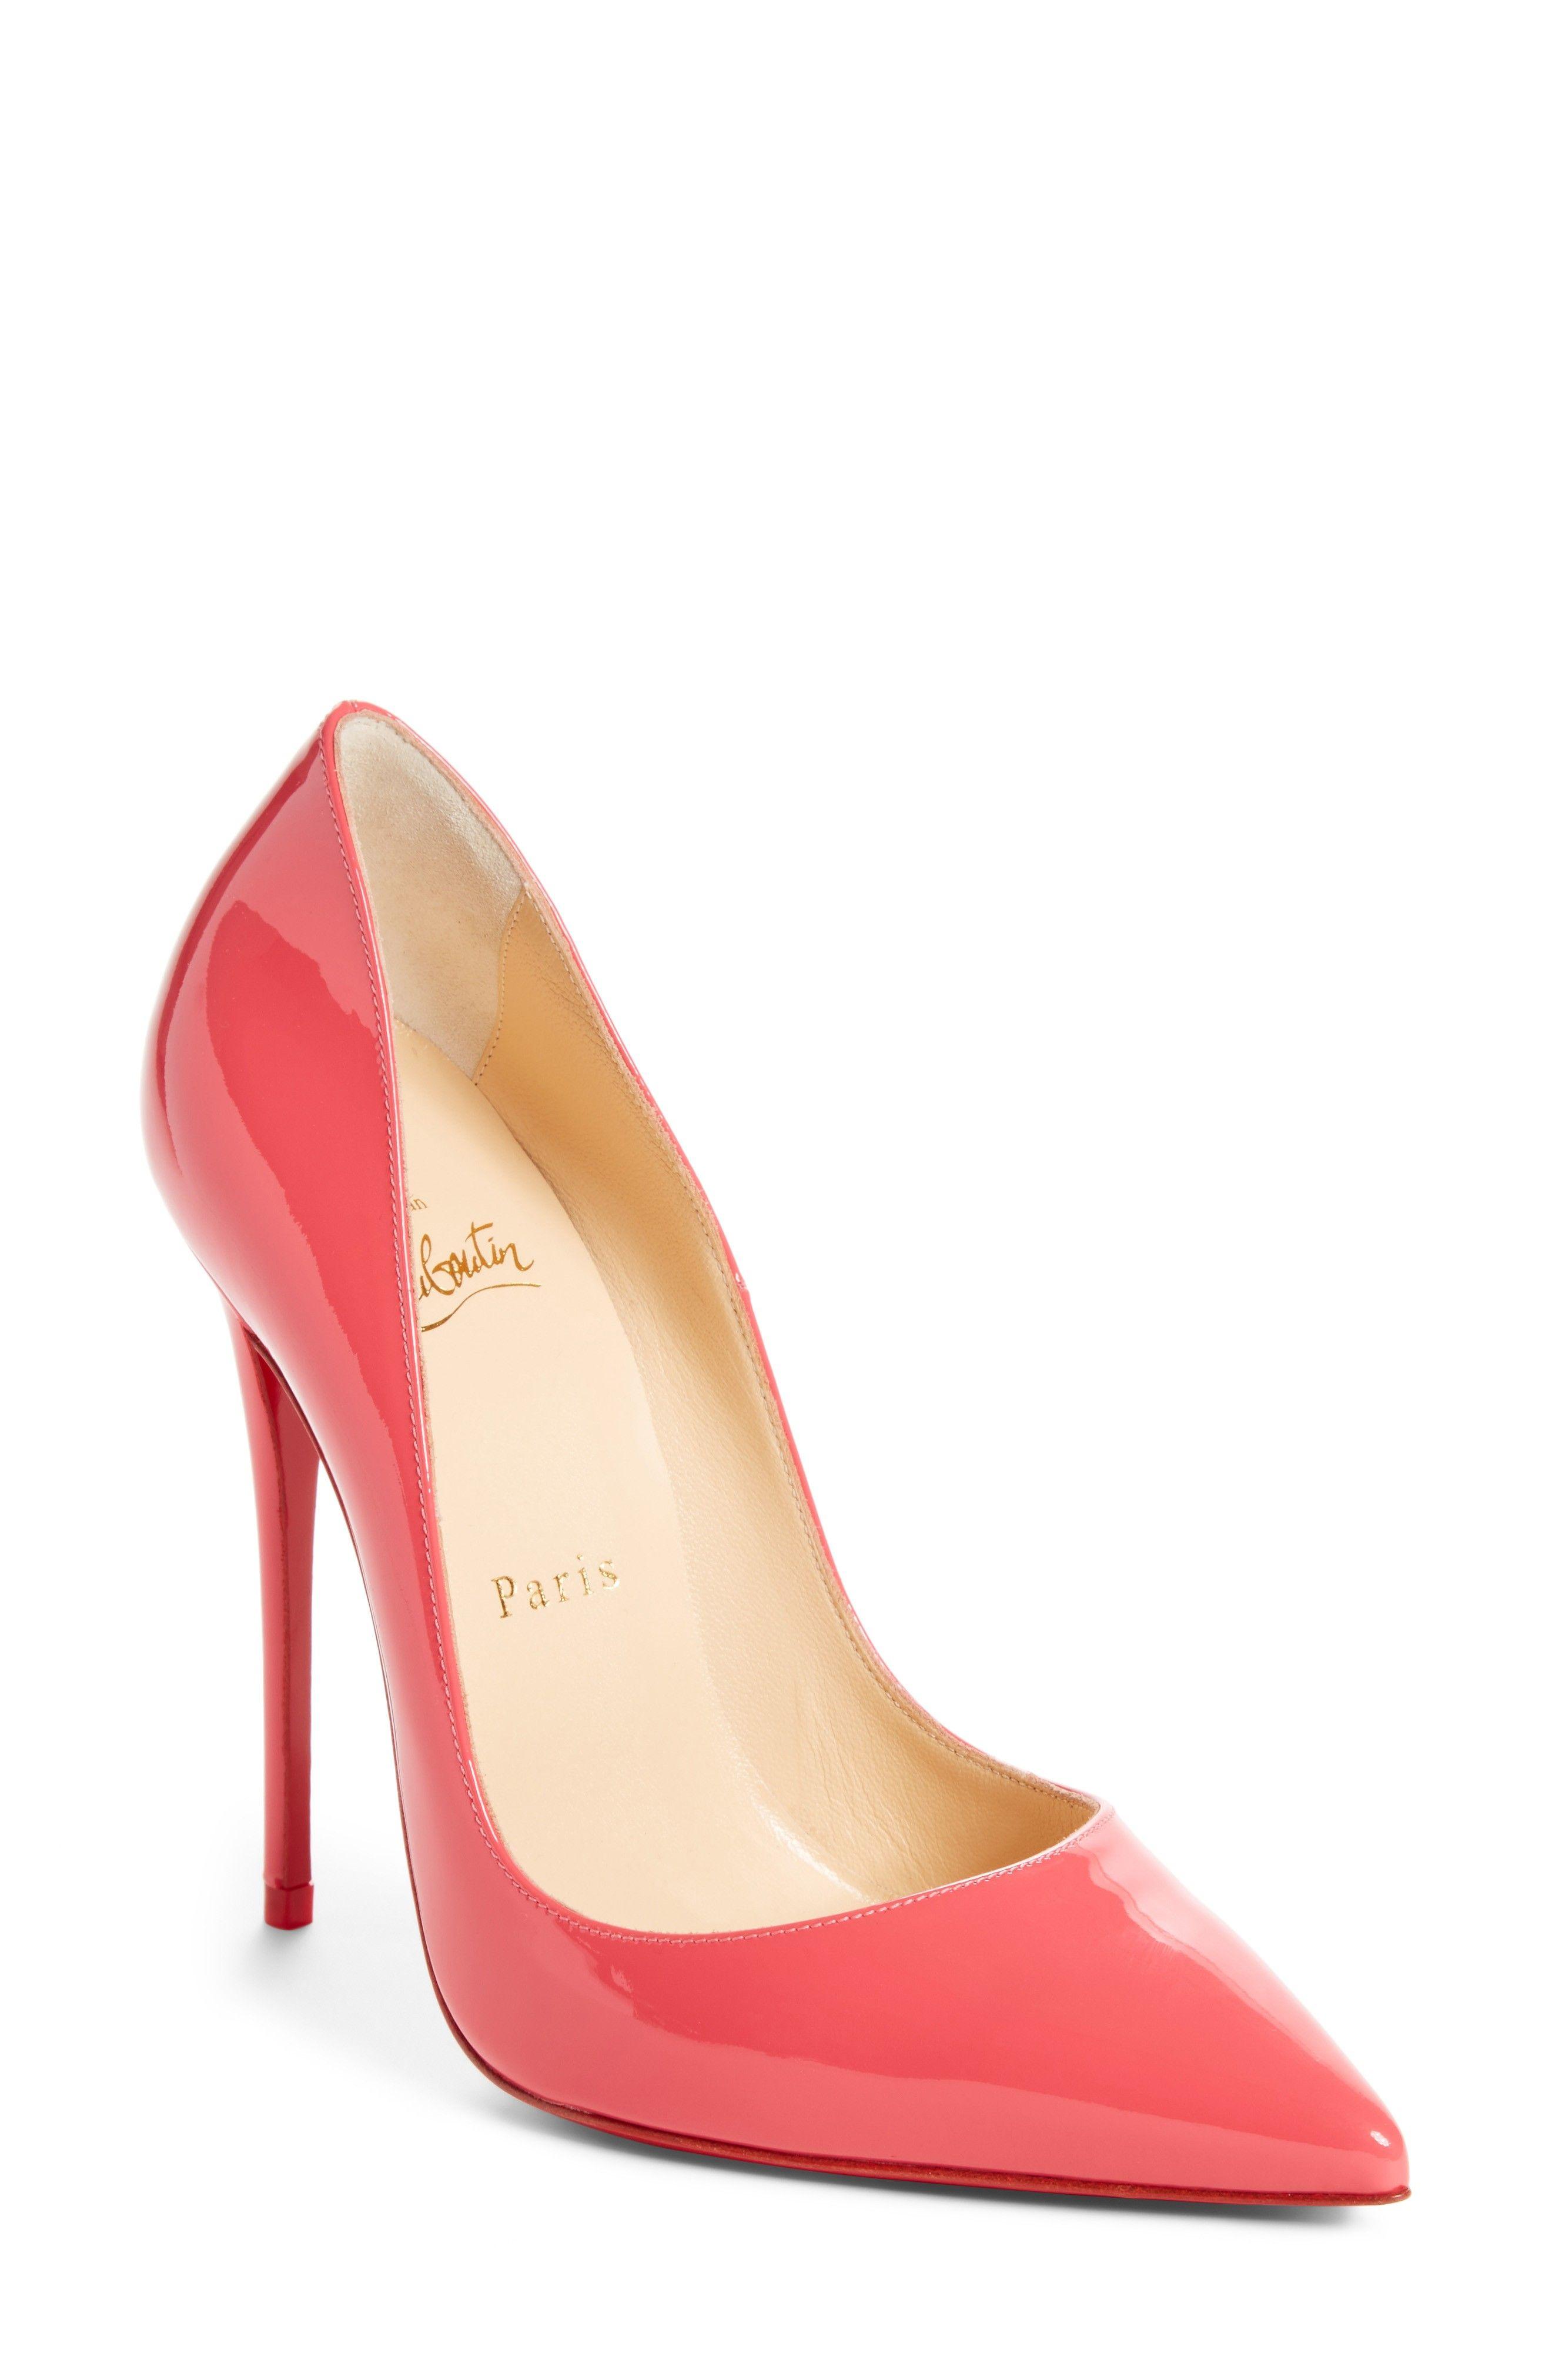 1113a9b3f58 Buy CHRISTIAN LOUBOUTIN  So Kate  Pointy Toe Pump for shopping. New CHRISTIAN  LOUBOUTIN Heels.   675  SKU EWUQ48965BWOU26929